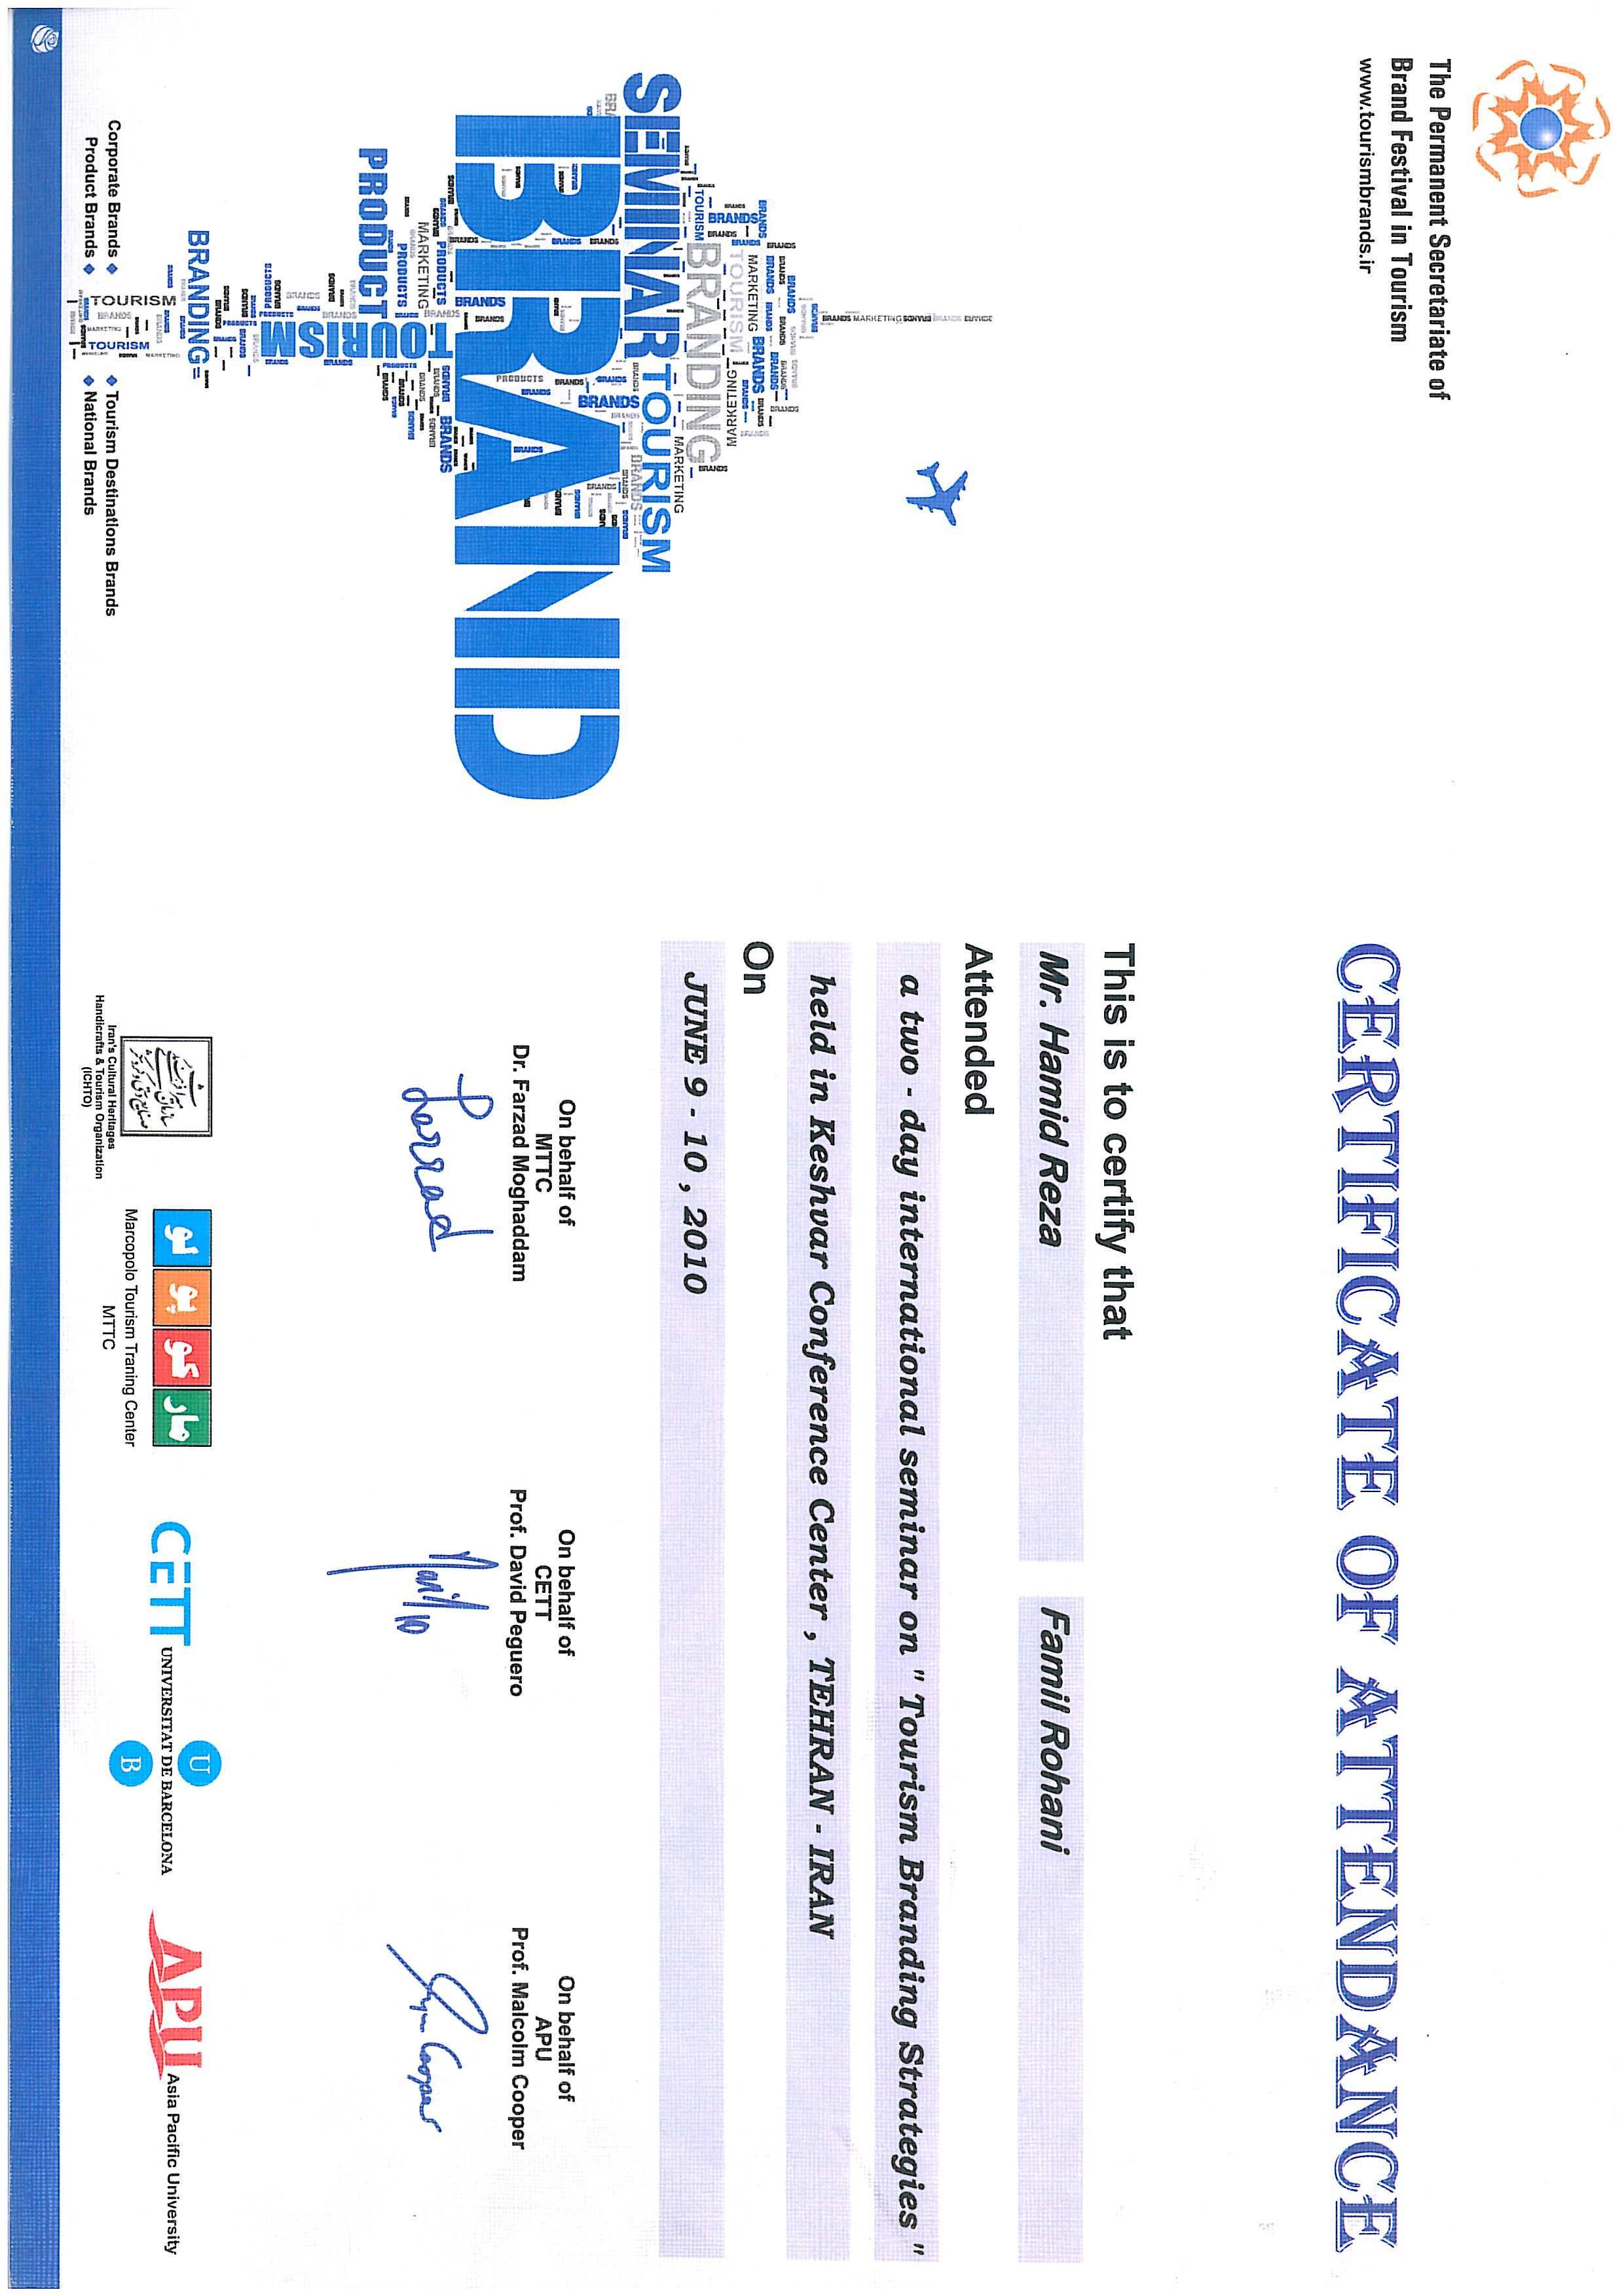 SKMBT_C45013082012161 | Kalout Travel Agency